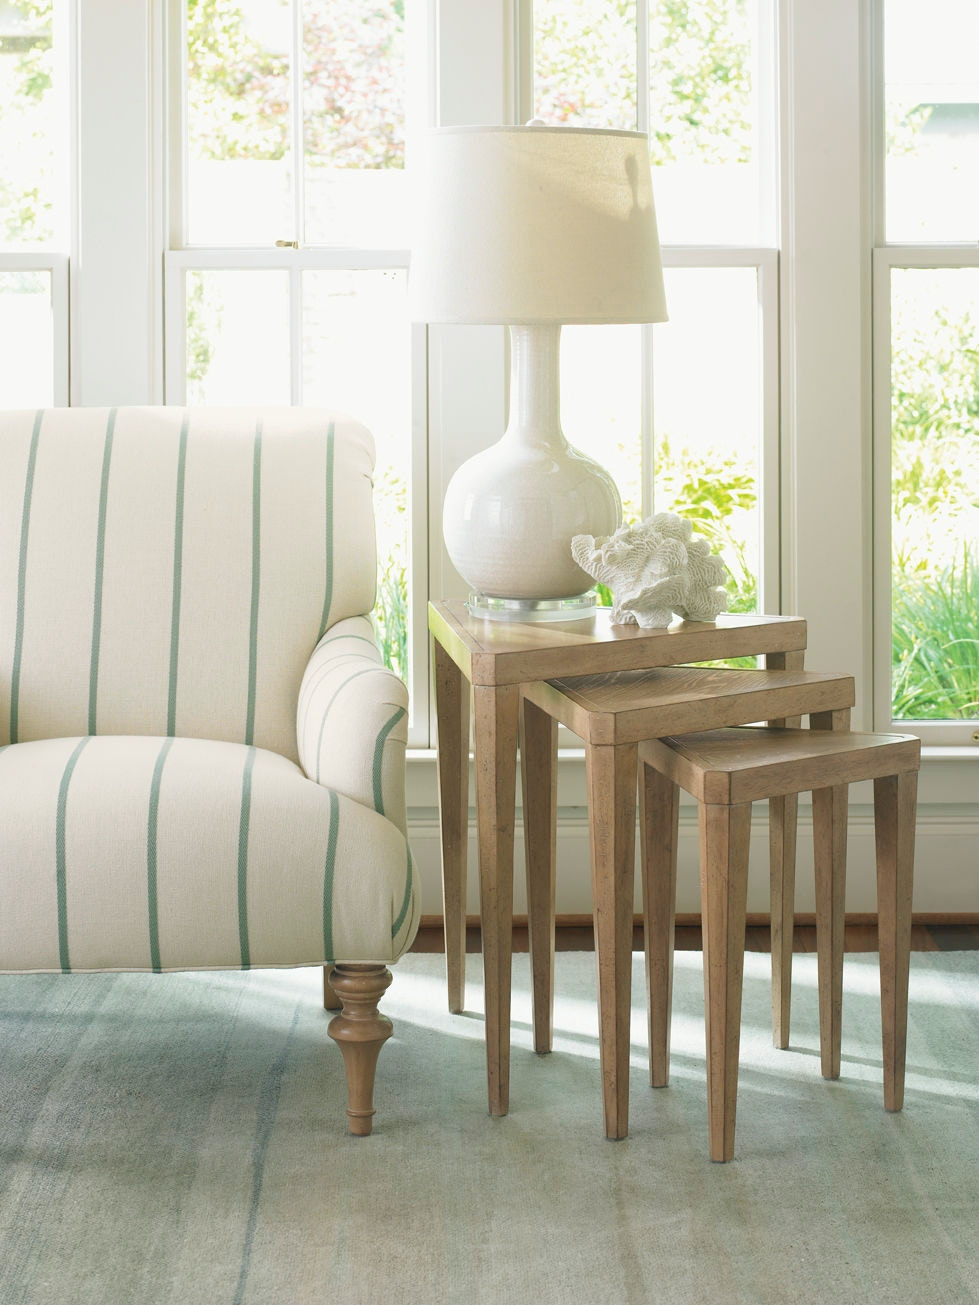 Lexington Cupertino Triangular Nesting Tables LX010830952 From Walter E.  Smithe Furniture + Design